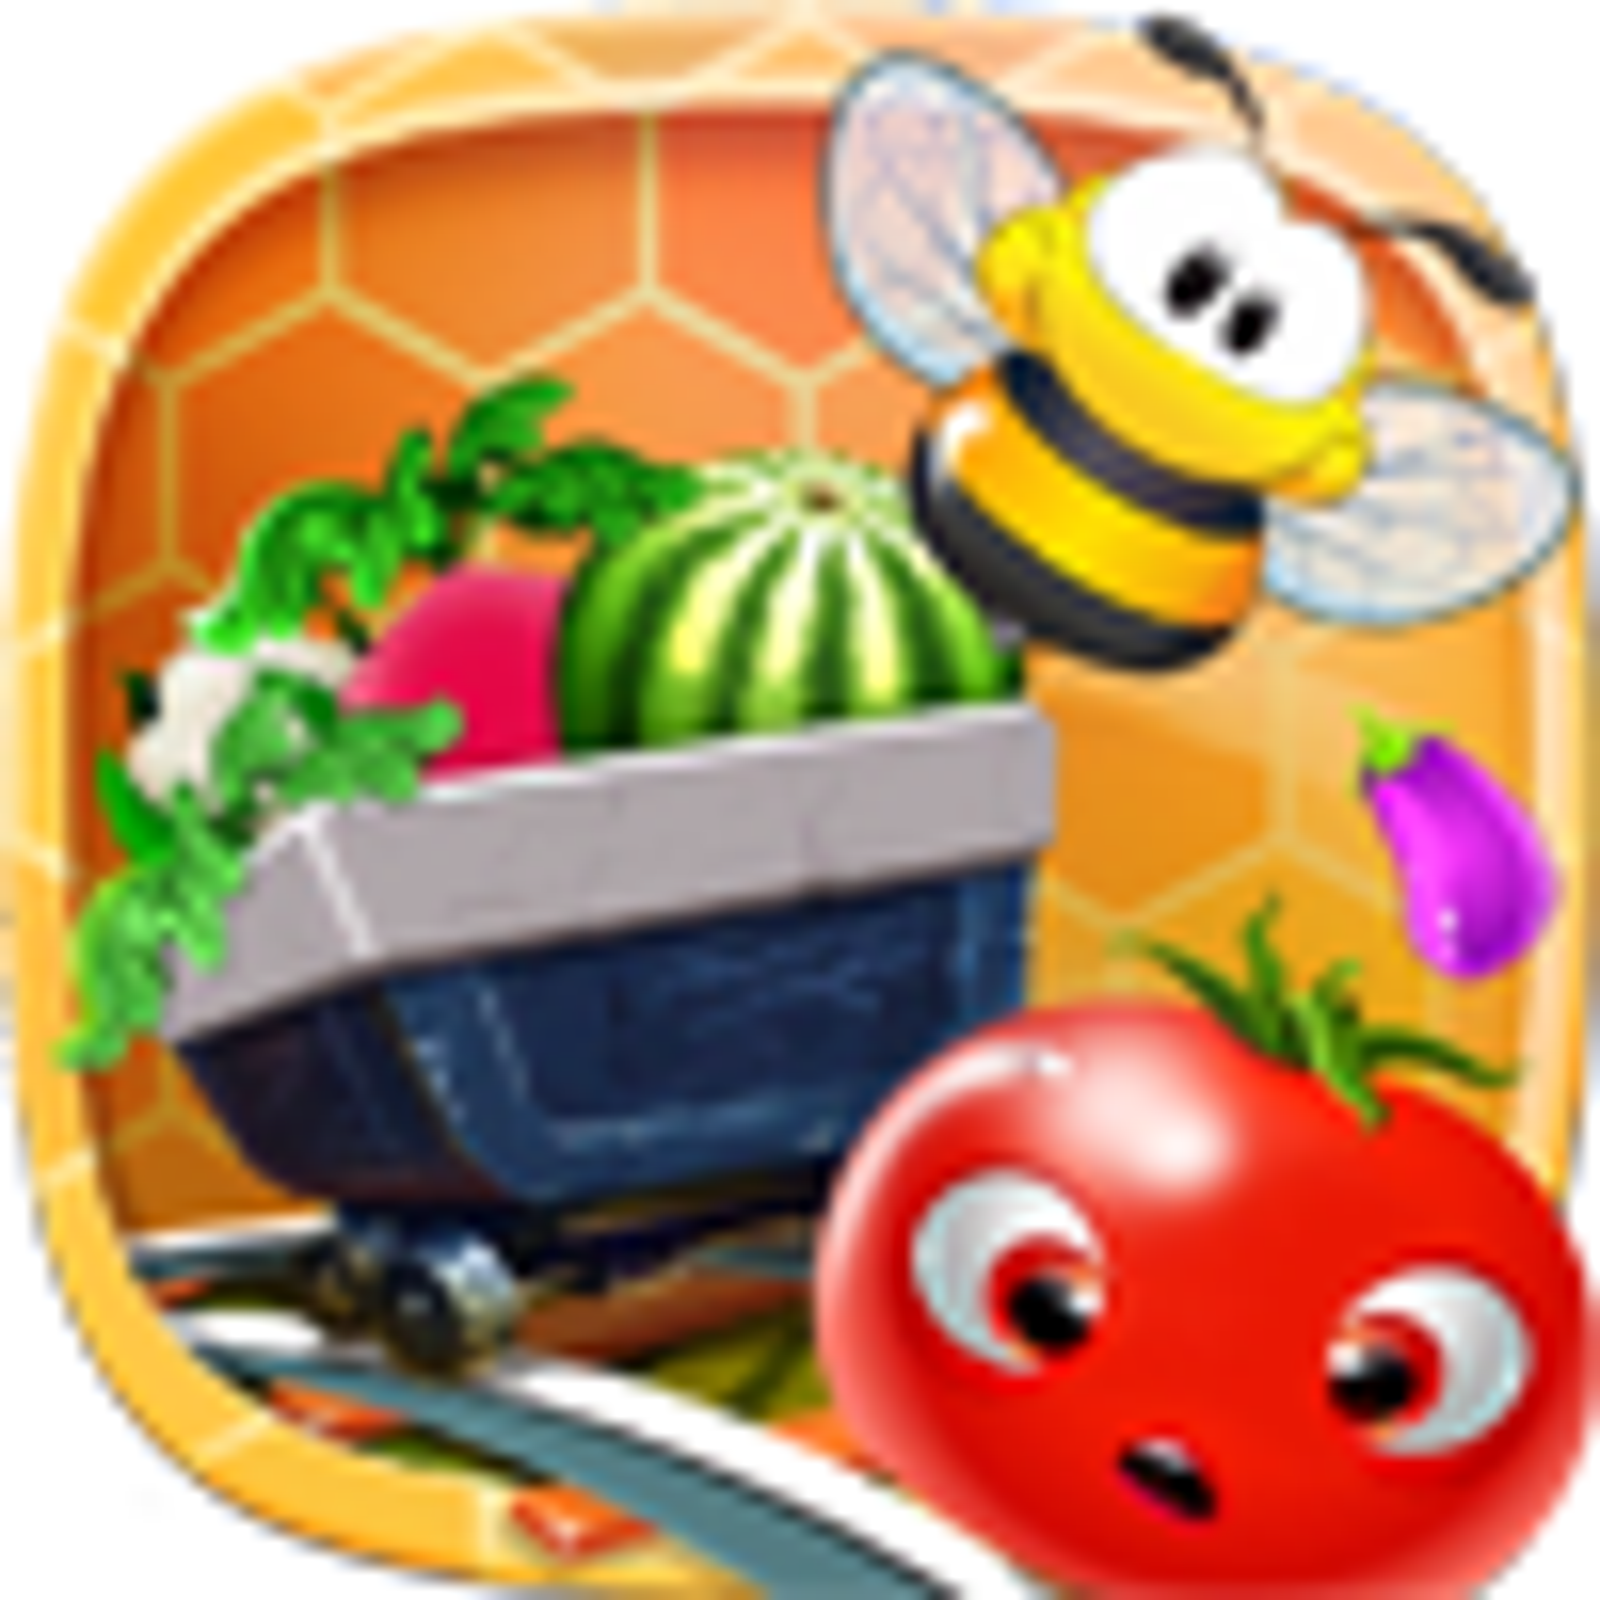 Honeycomb Farm Match 3